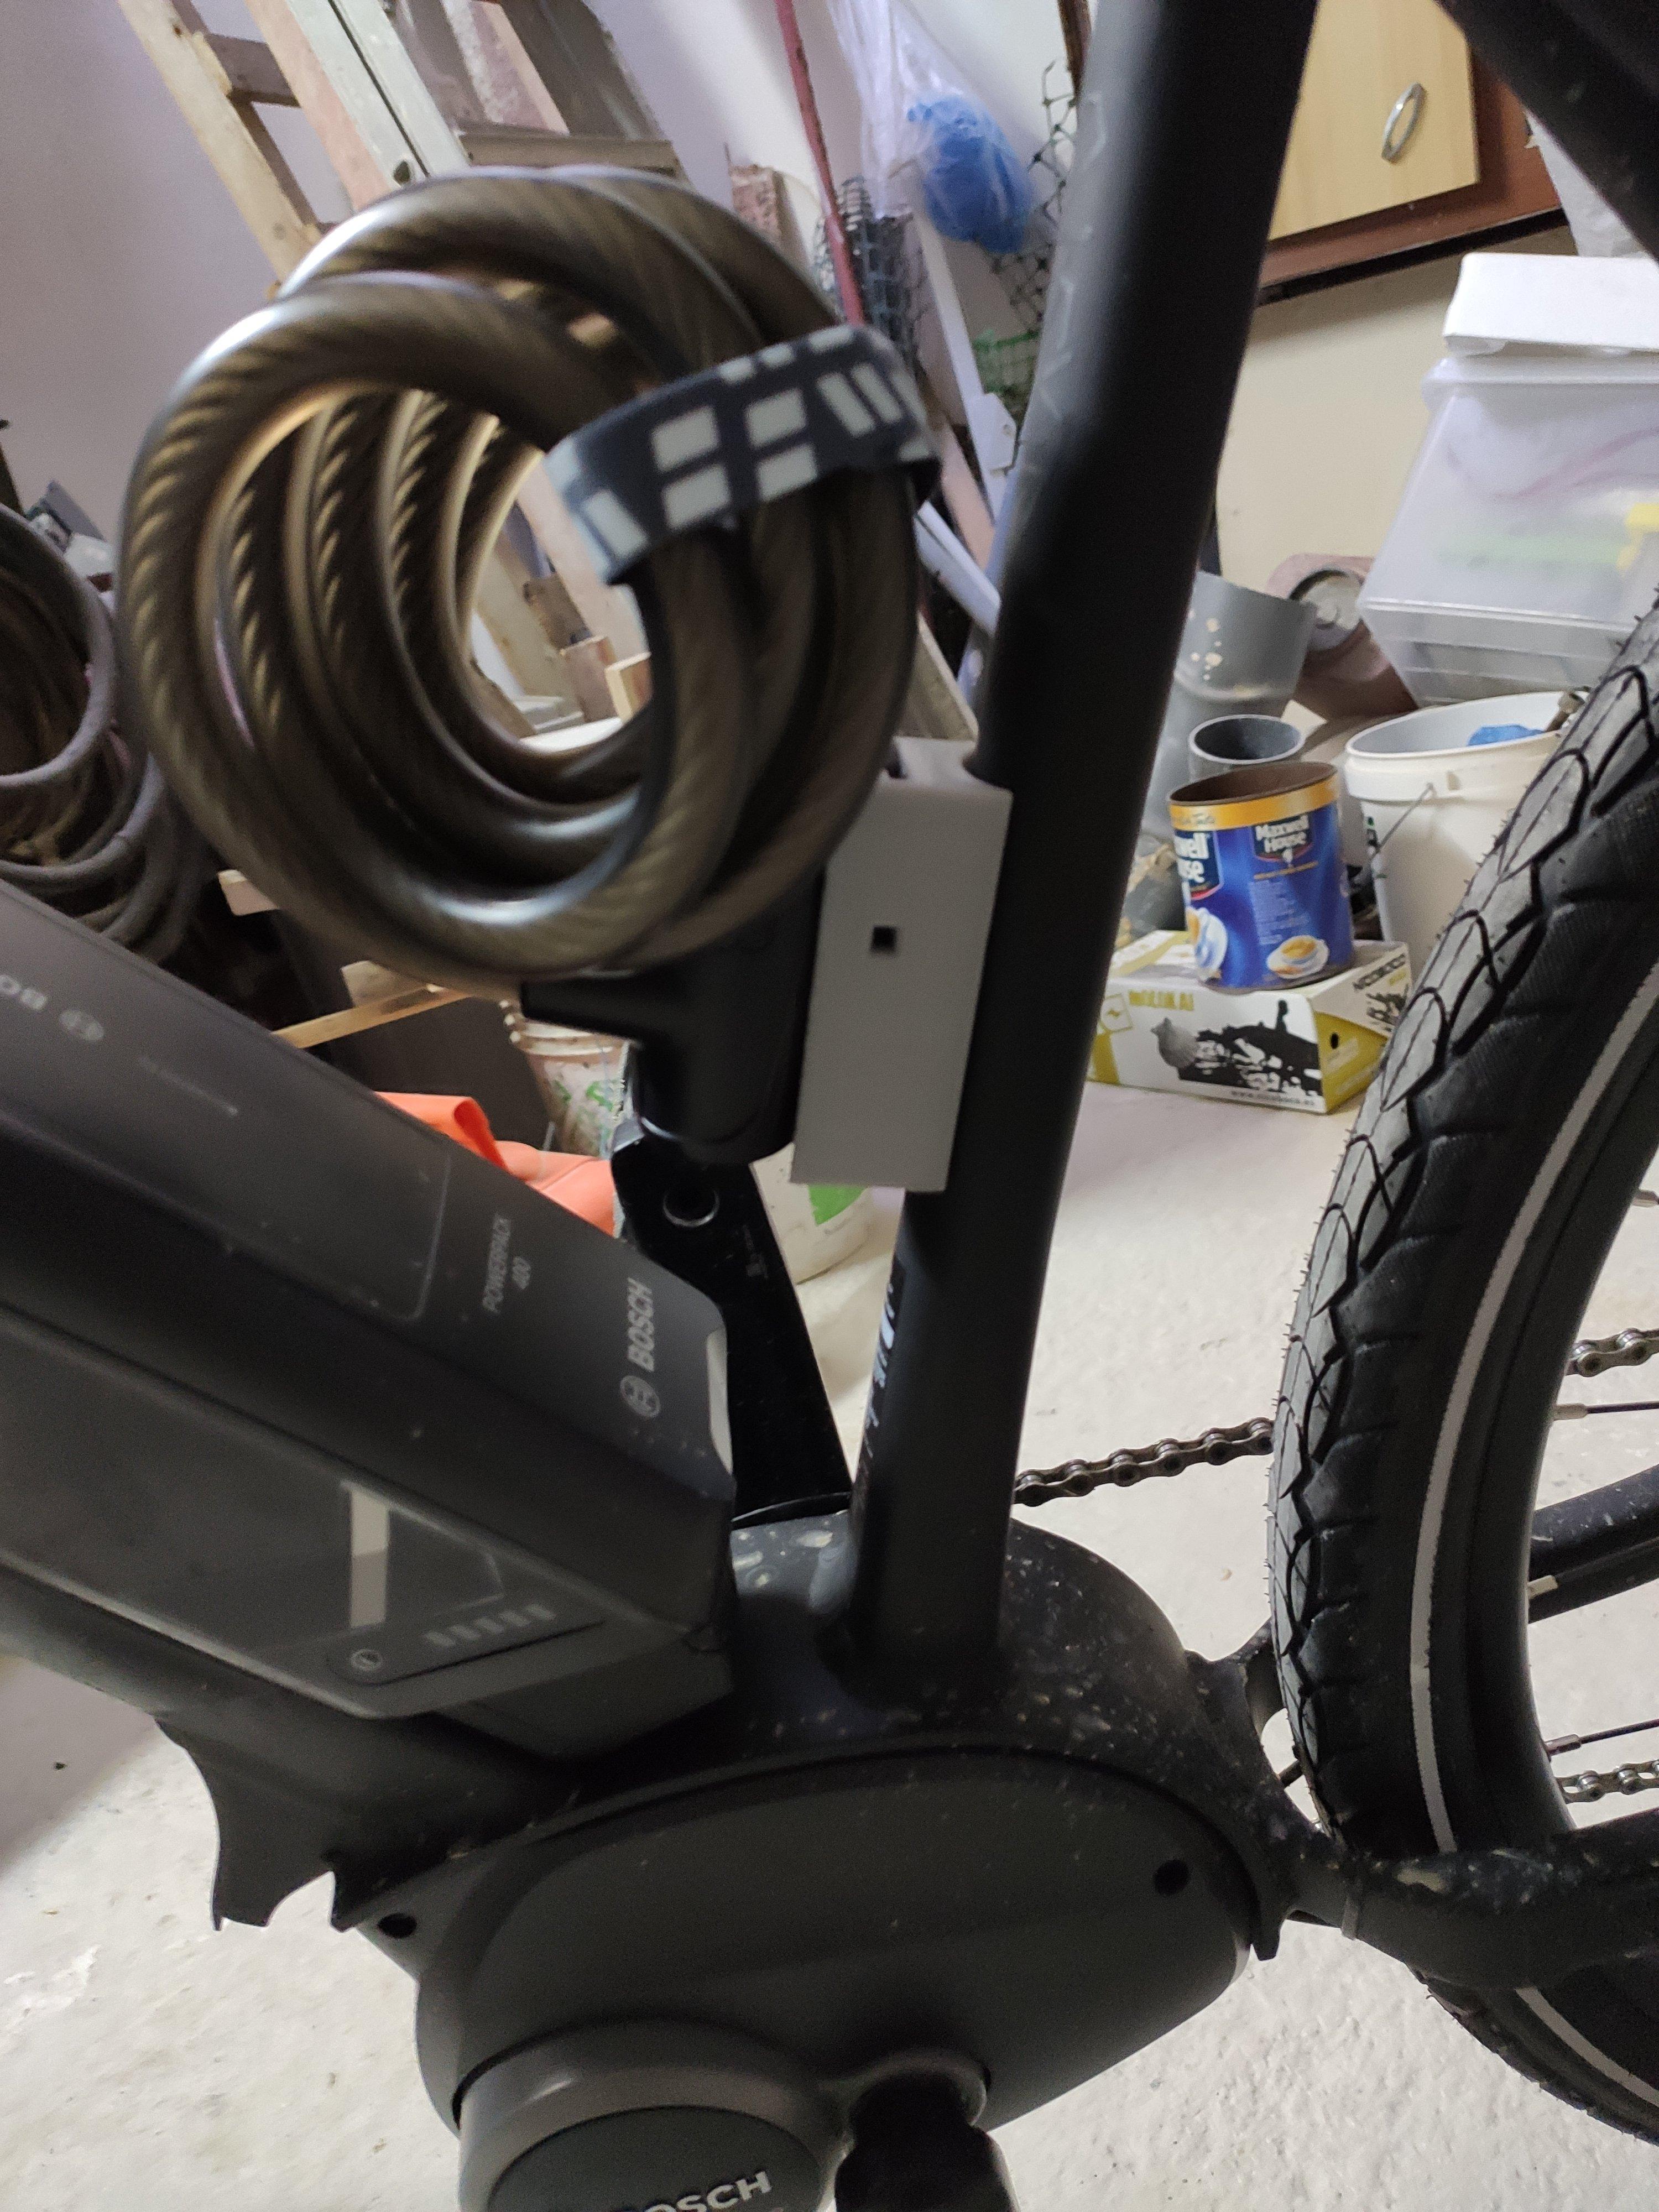 IMG_20191110_110638.jpg Download free STL file Bicycle Lock Bracket • 3D printer object, Osprey